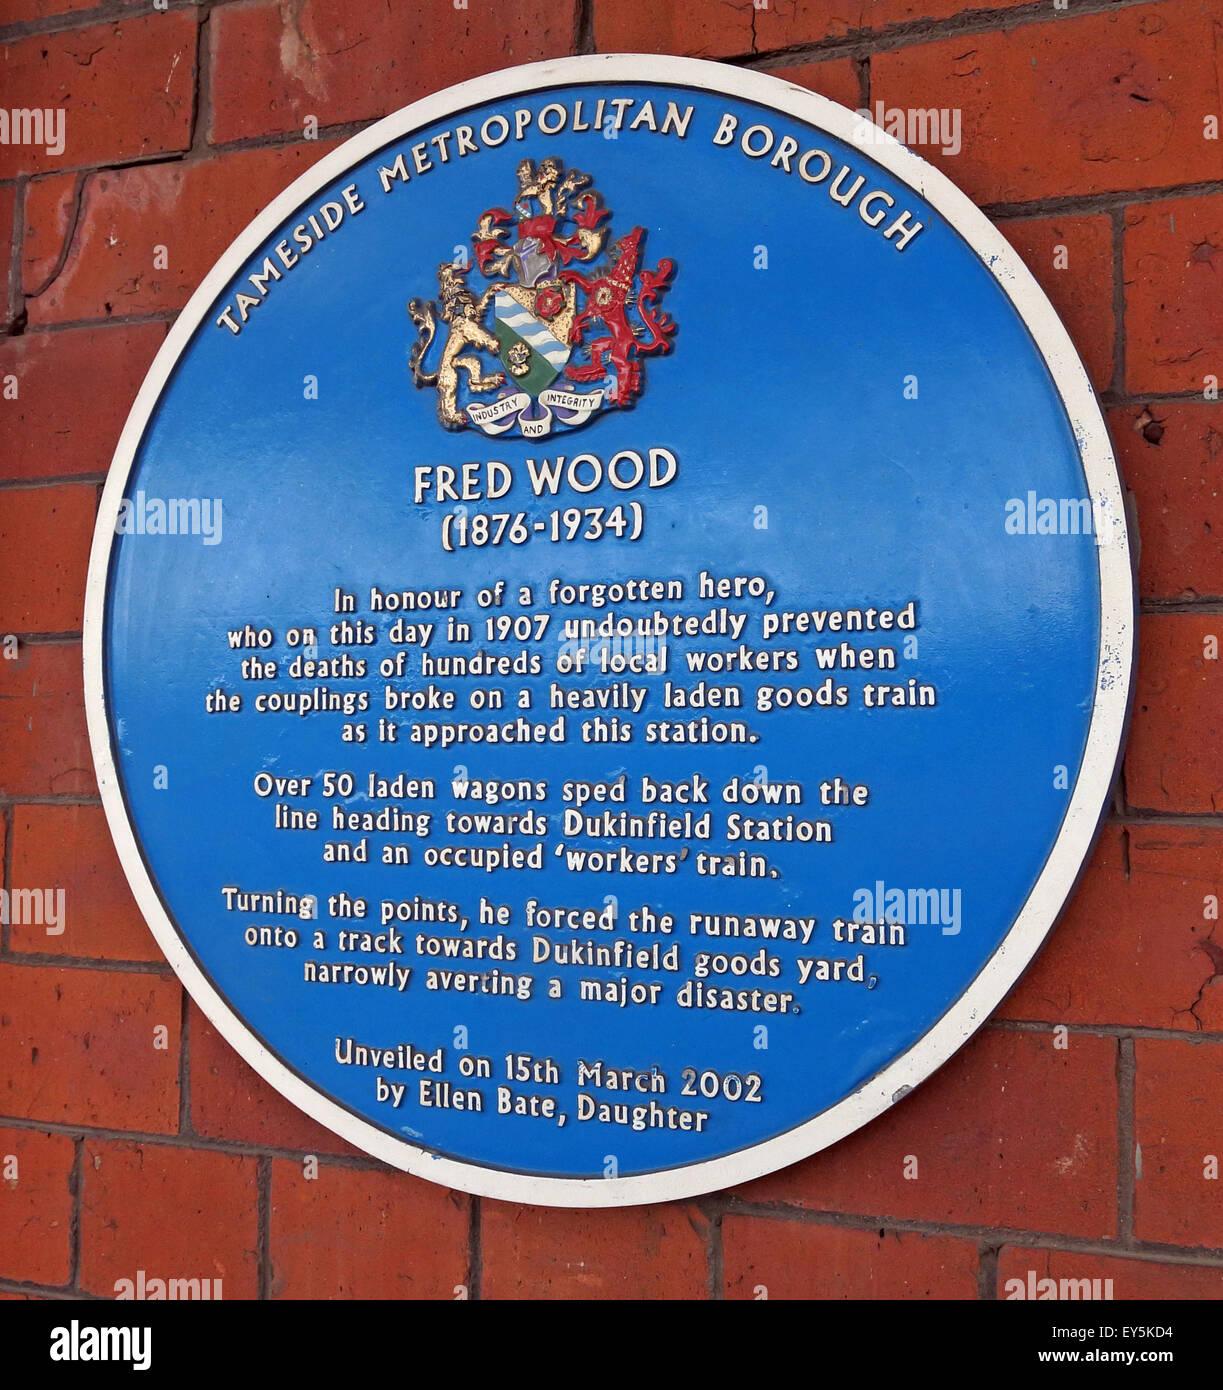 Laden Sie dieses Alamy Stockfoto Fred Holz Tameside blaue Plakette, Stalybridge Bahnhof, Lancashire, England, UK - EY5KD4